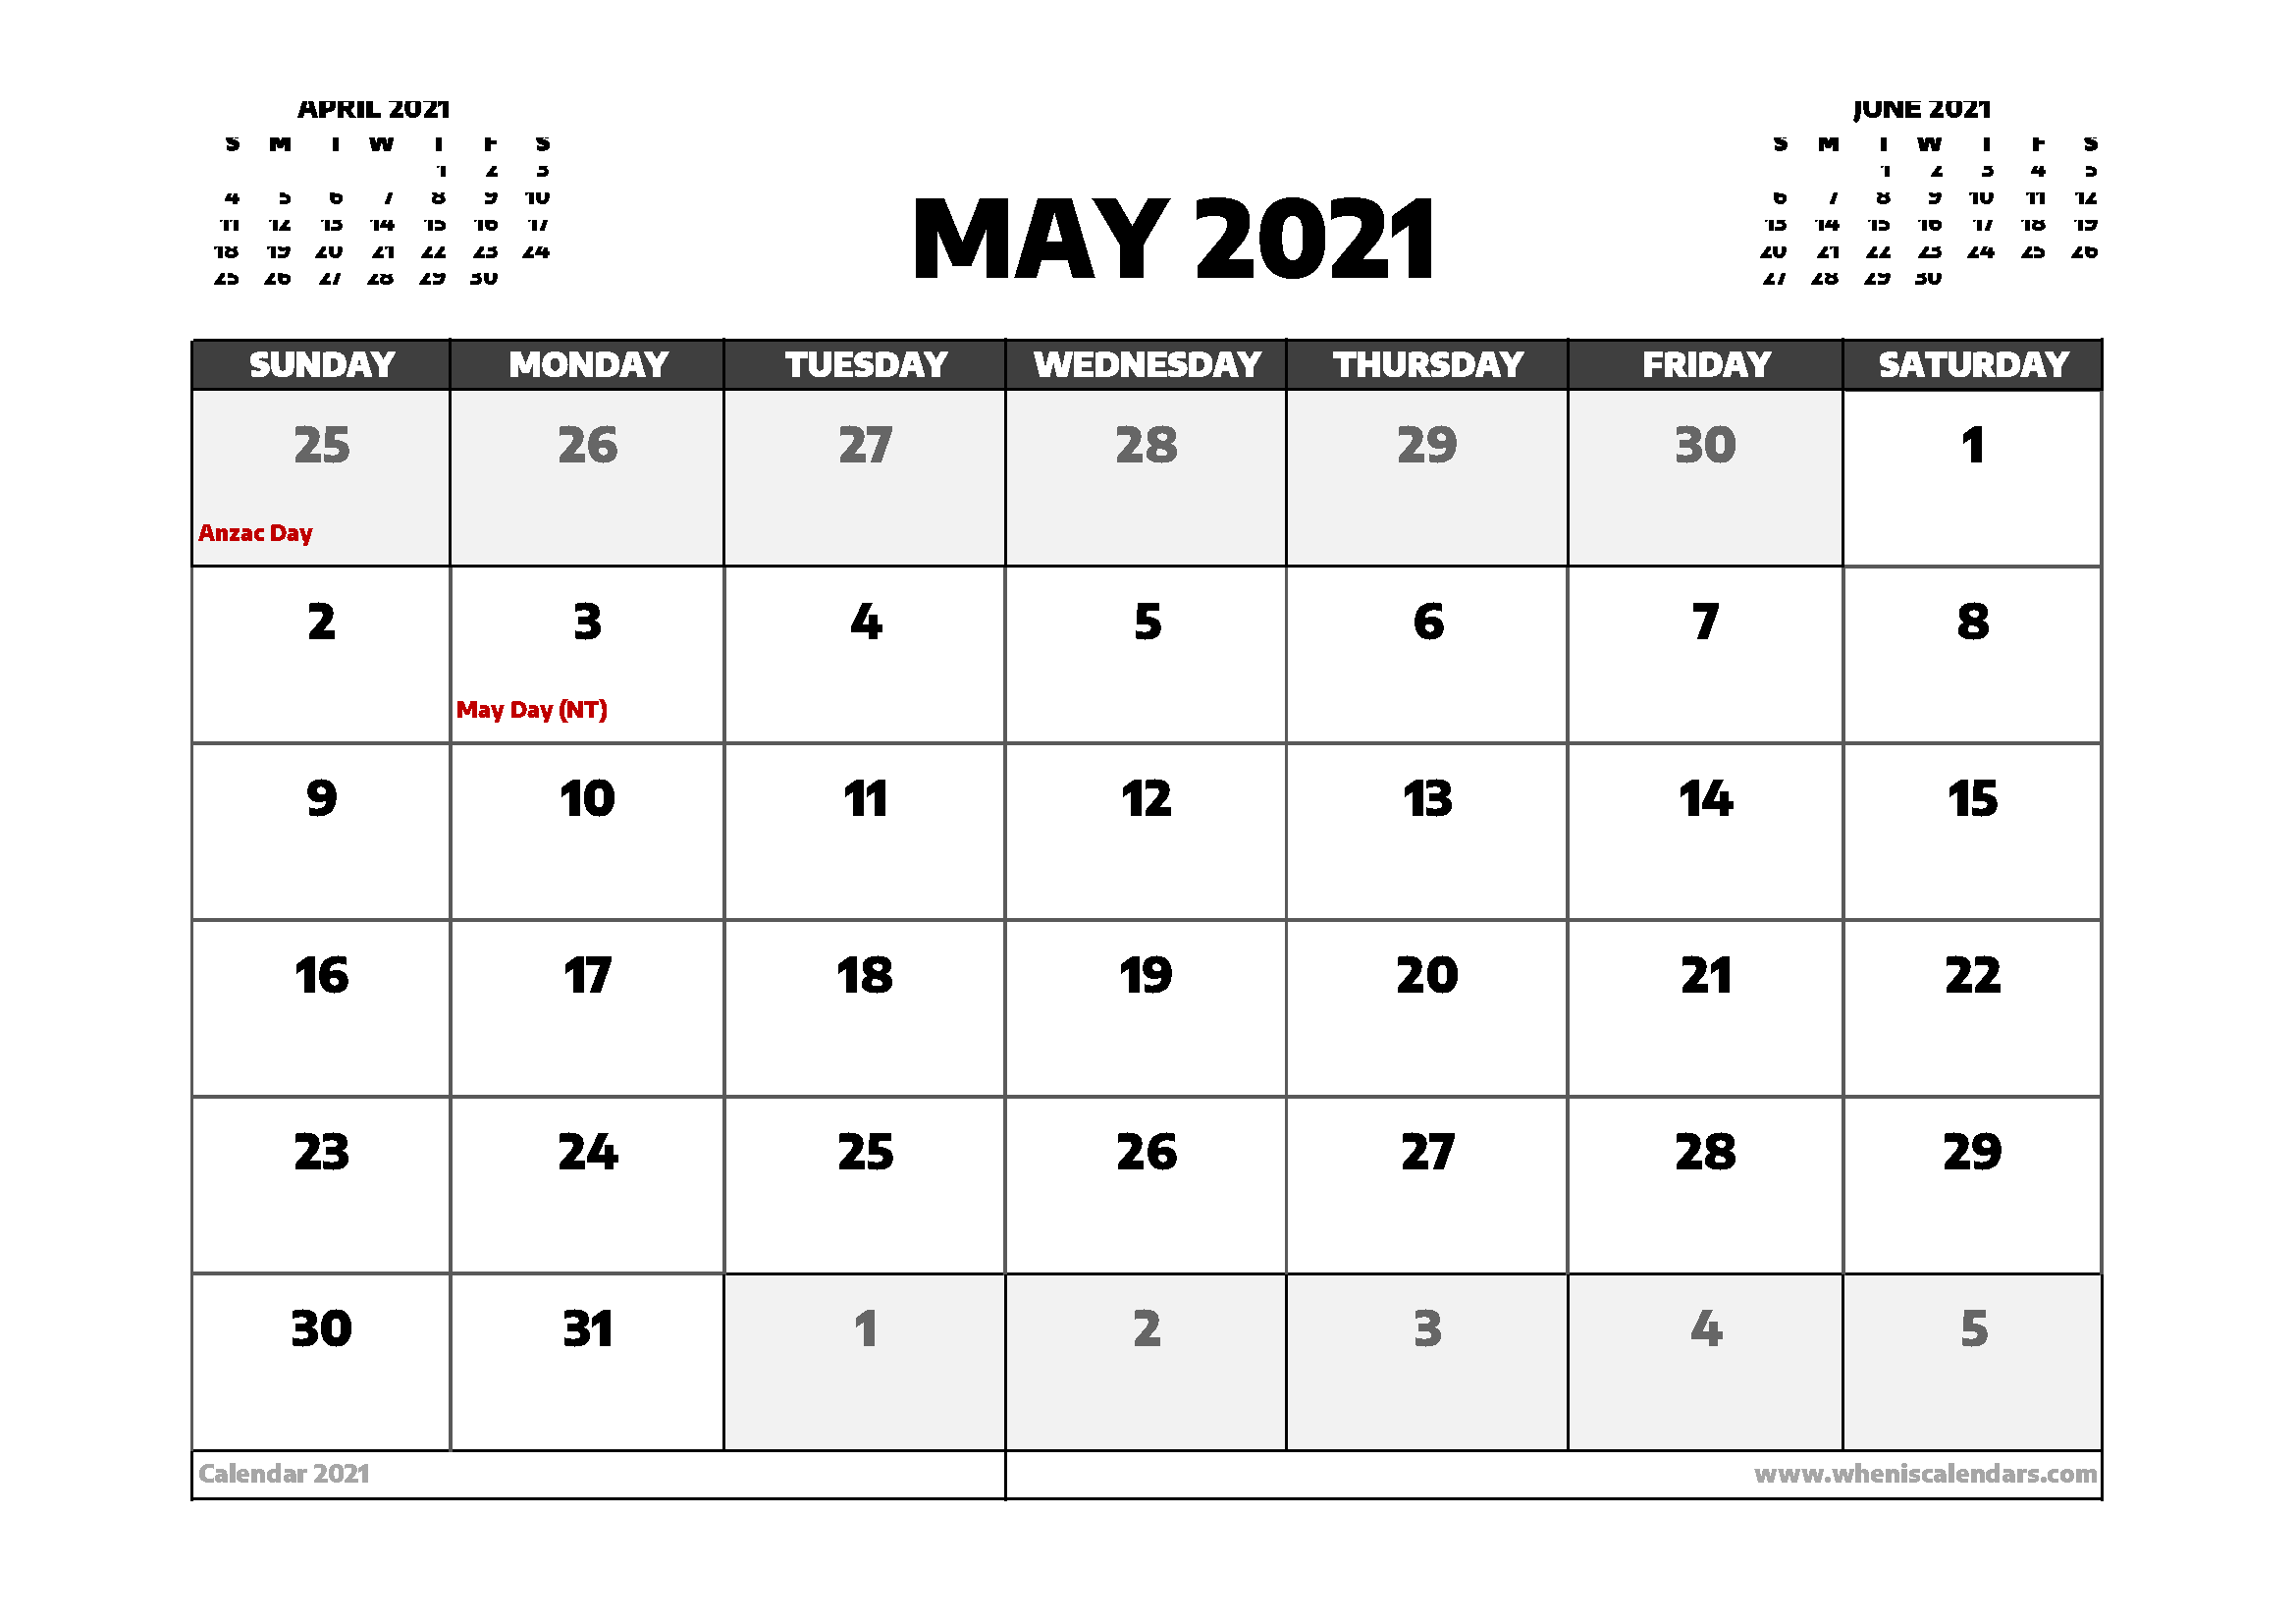 May 2021 Calendar Australia with Holidays